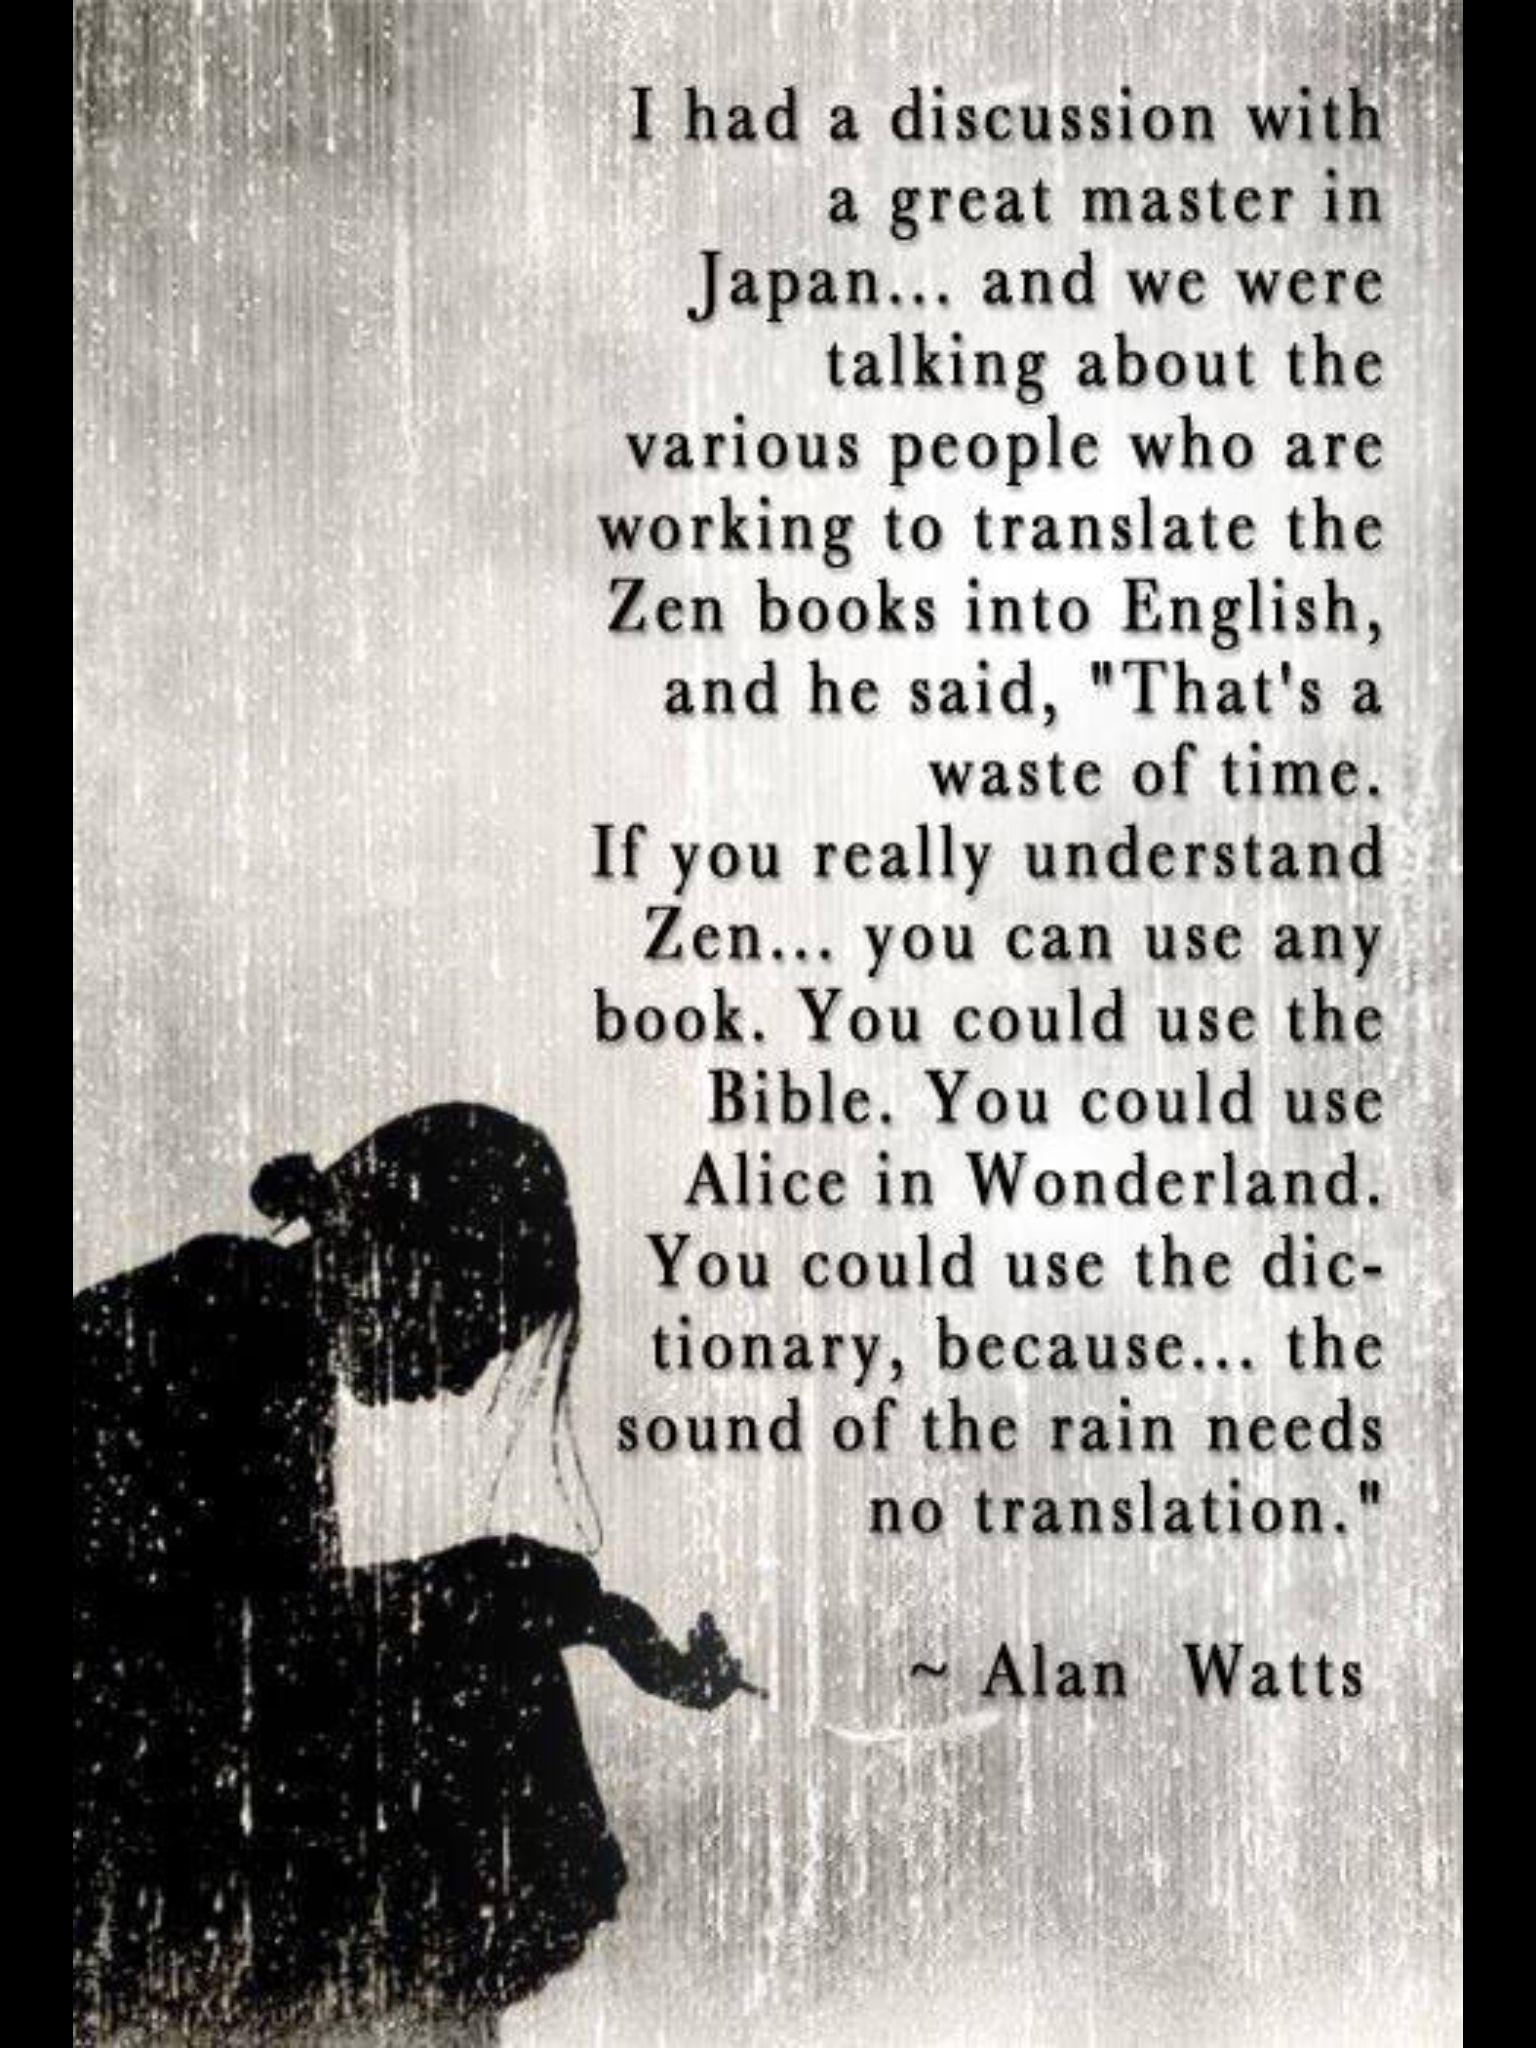 Alan watts quotes life implies death